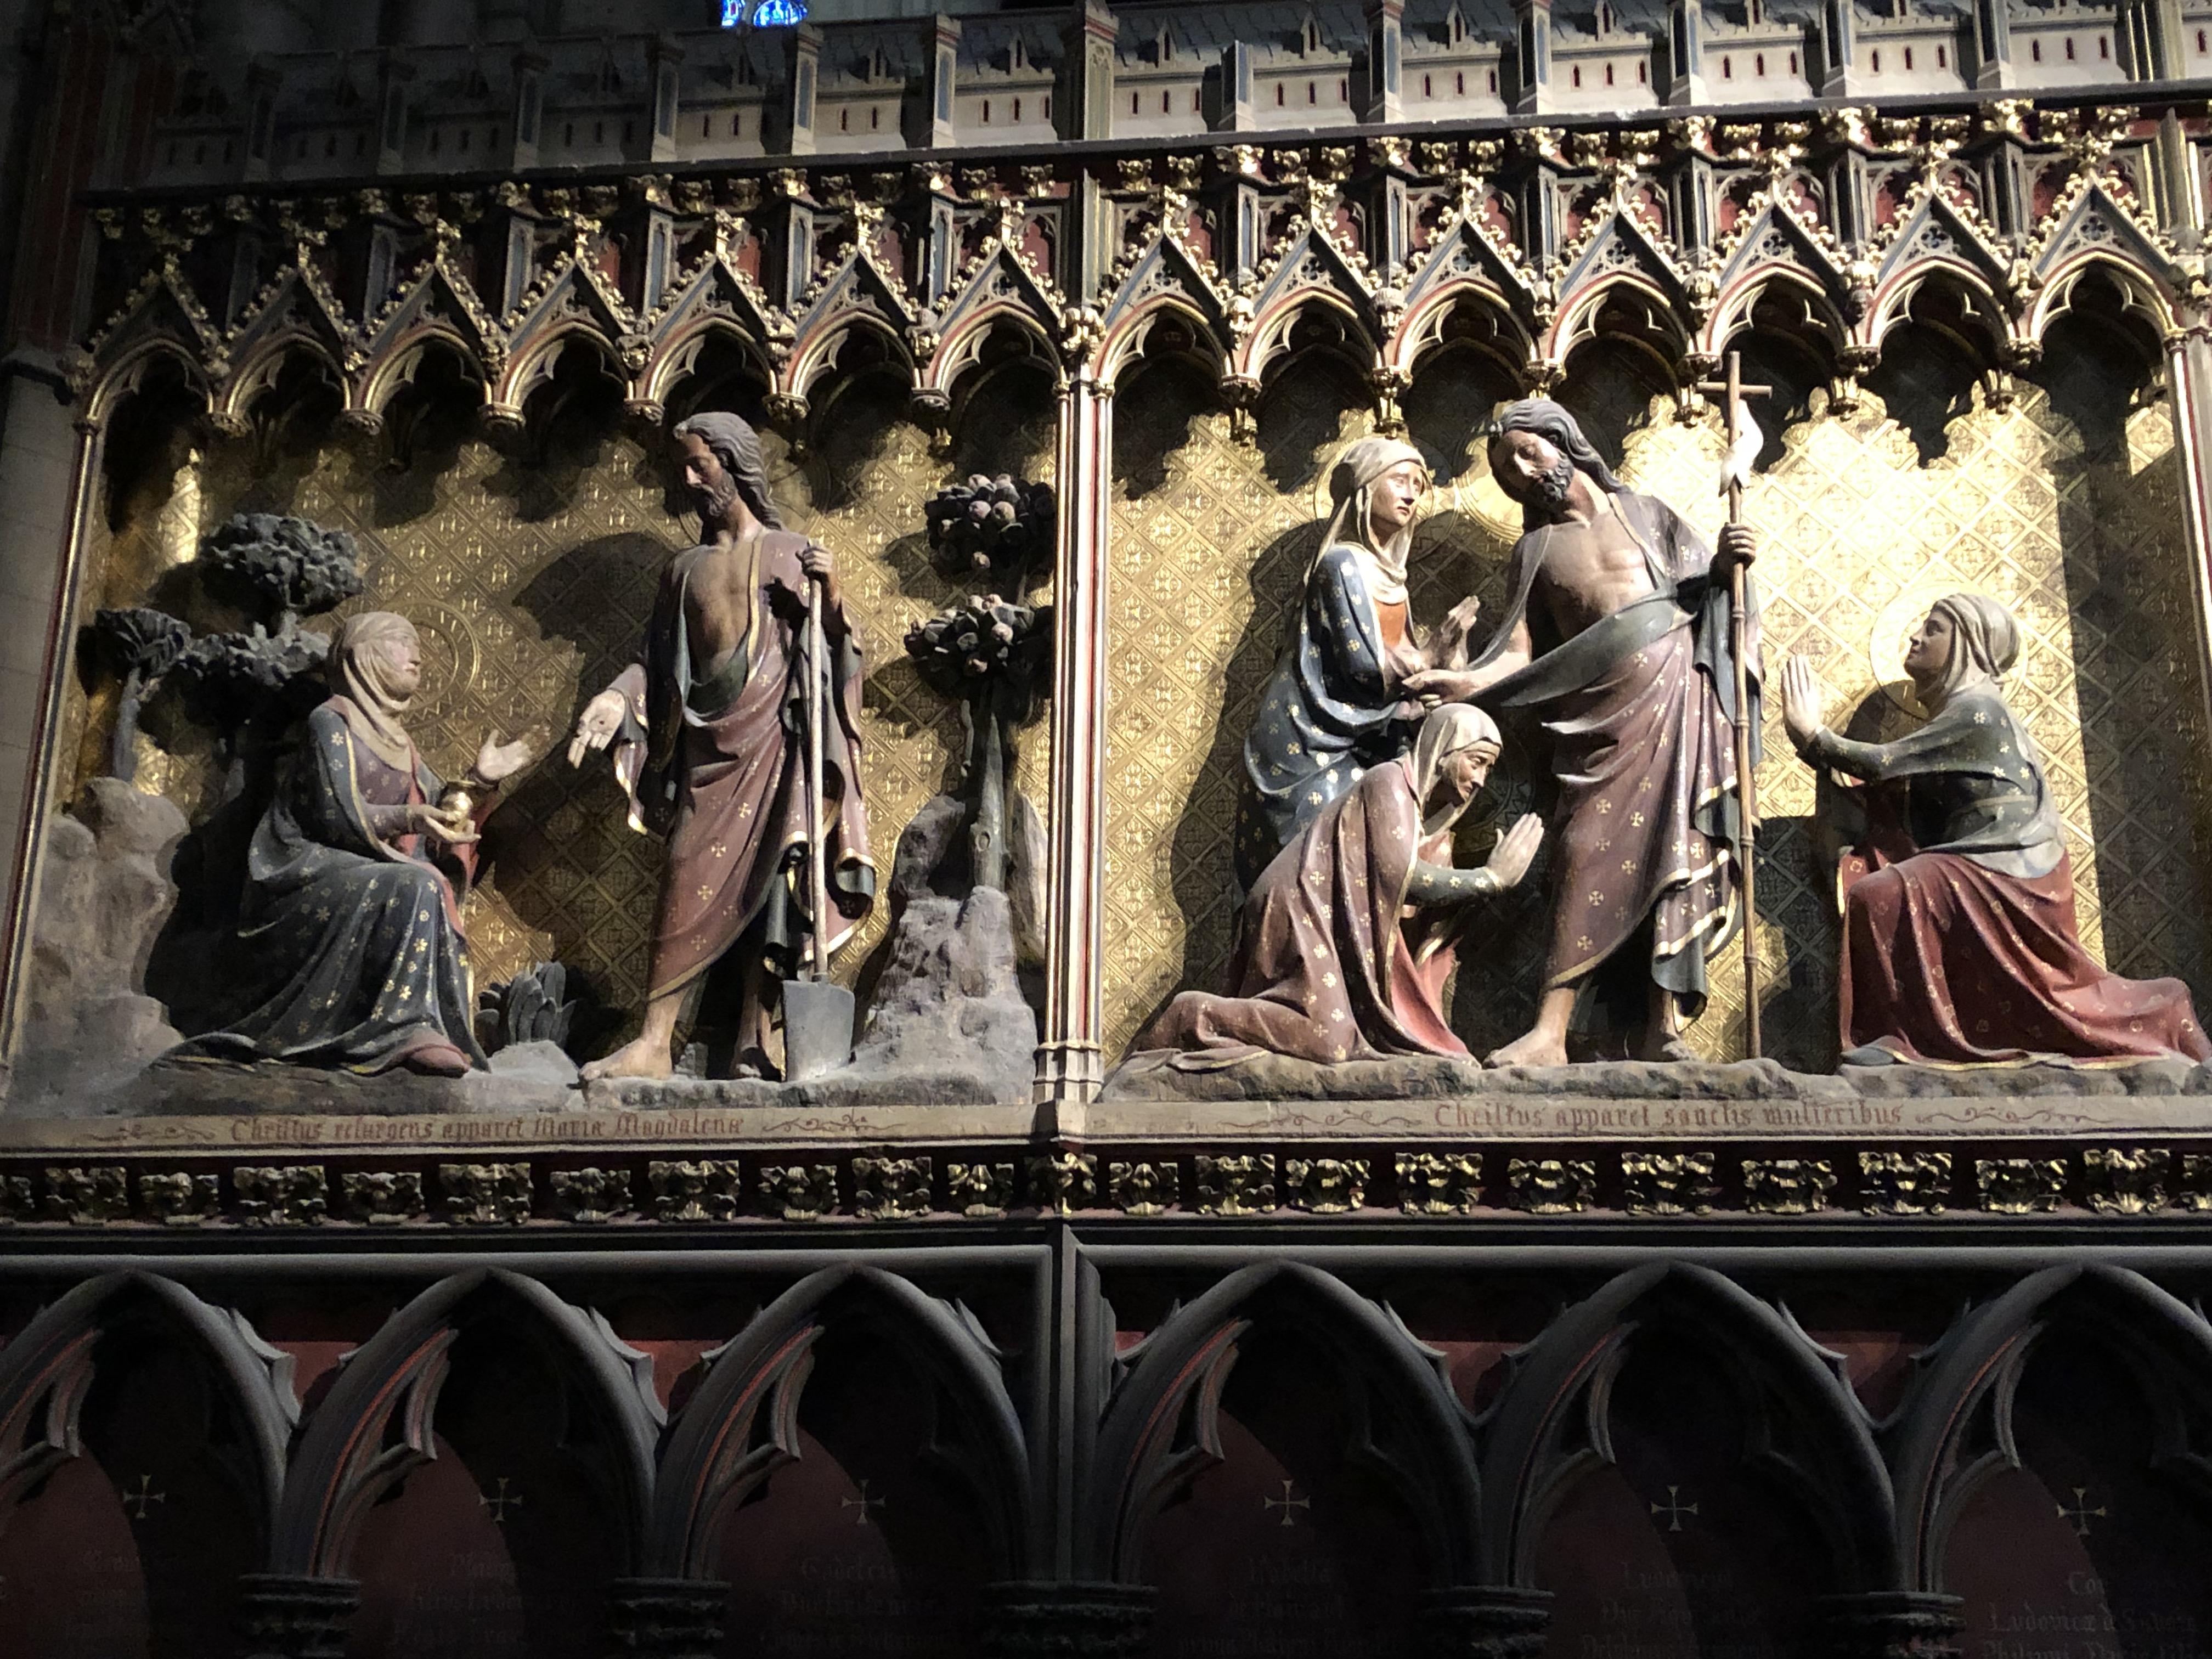 The Templar Knight - Mysteries of the Knights Templar